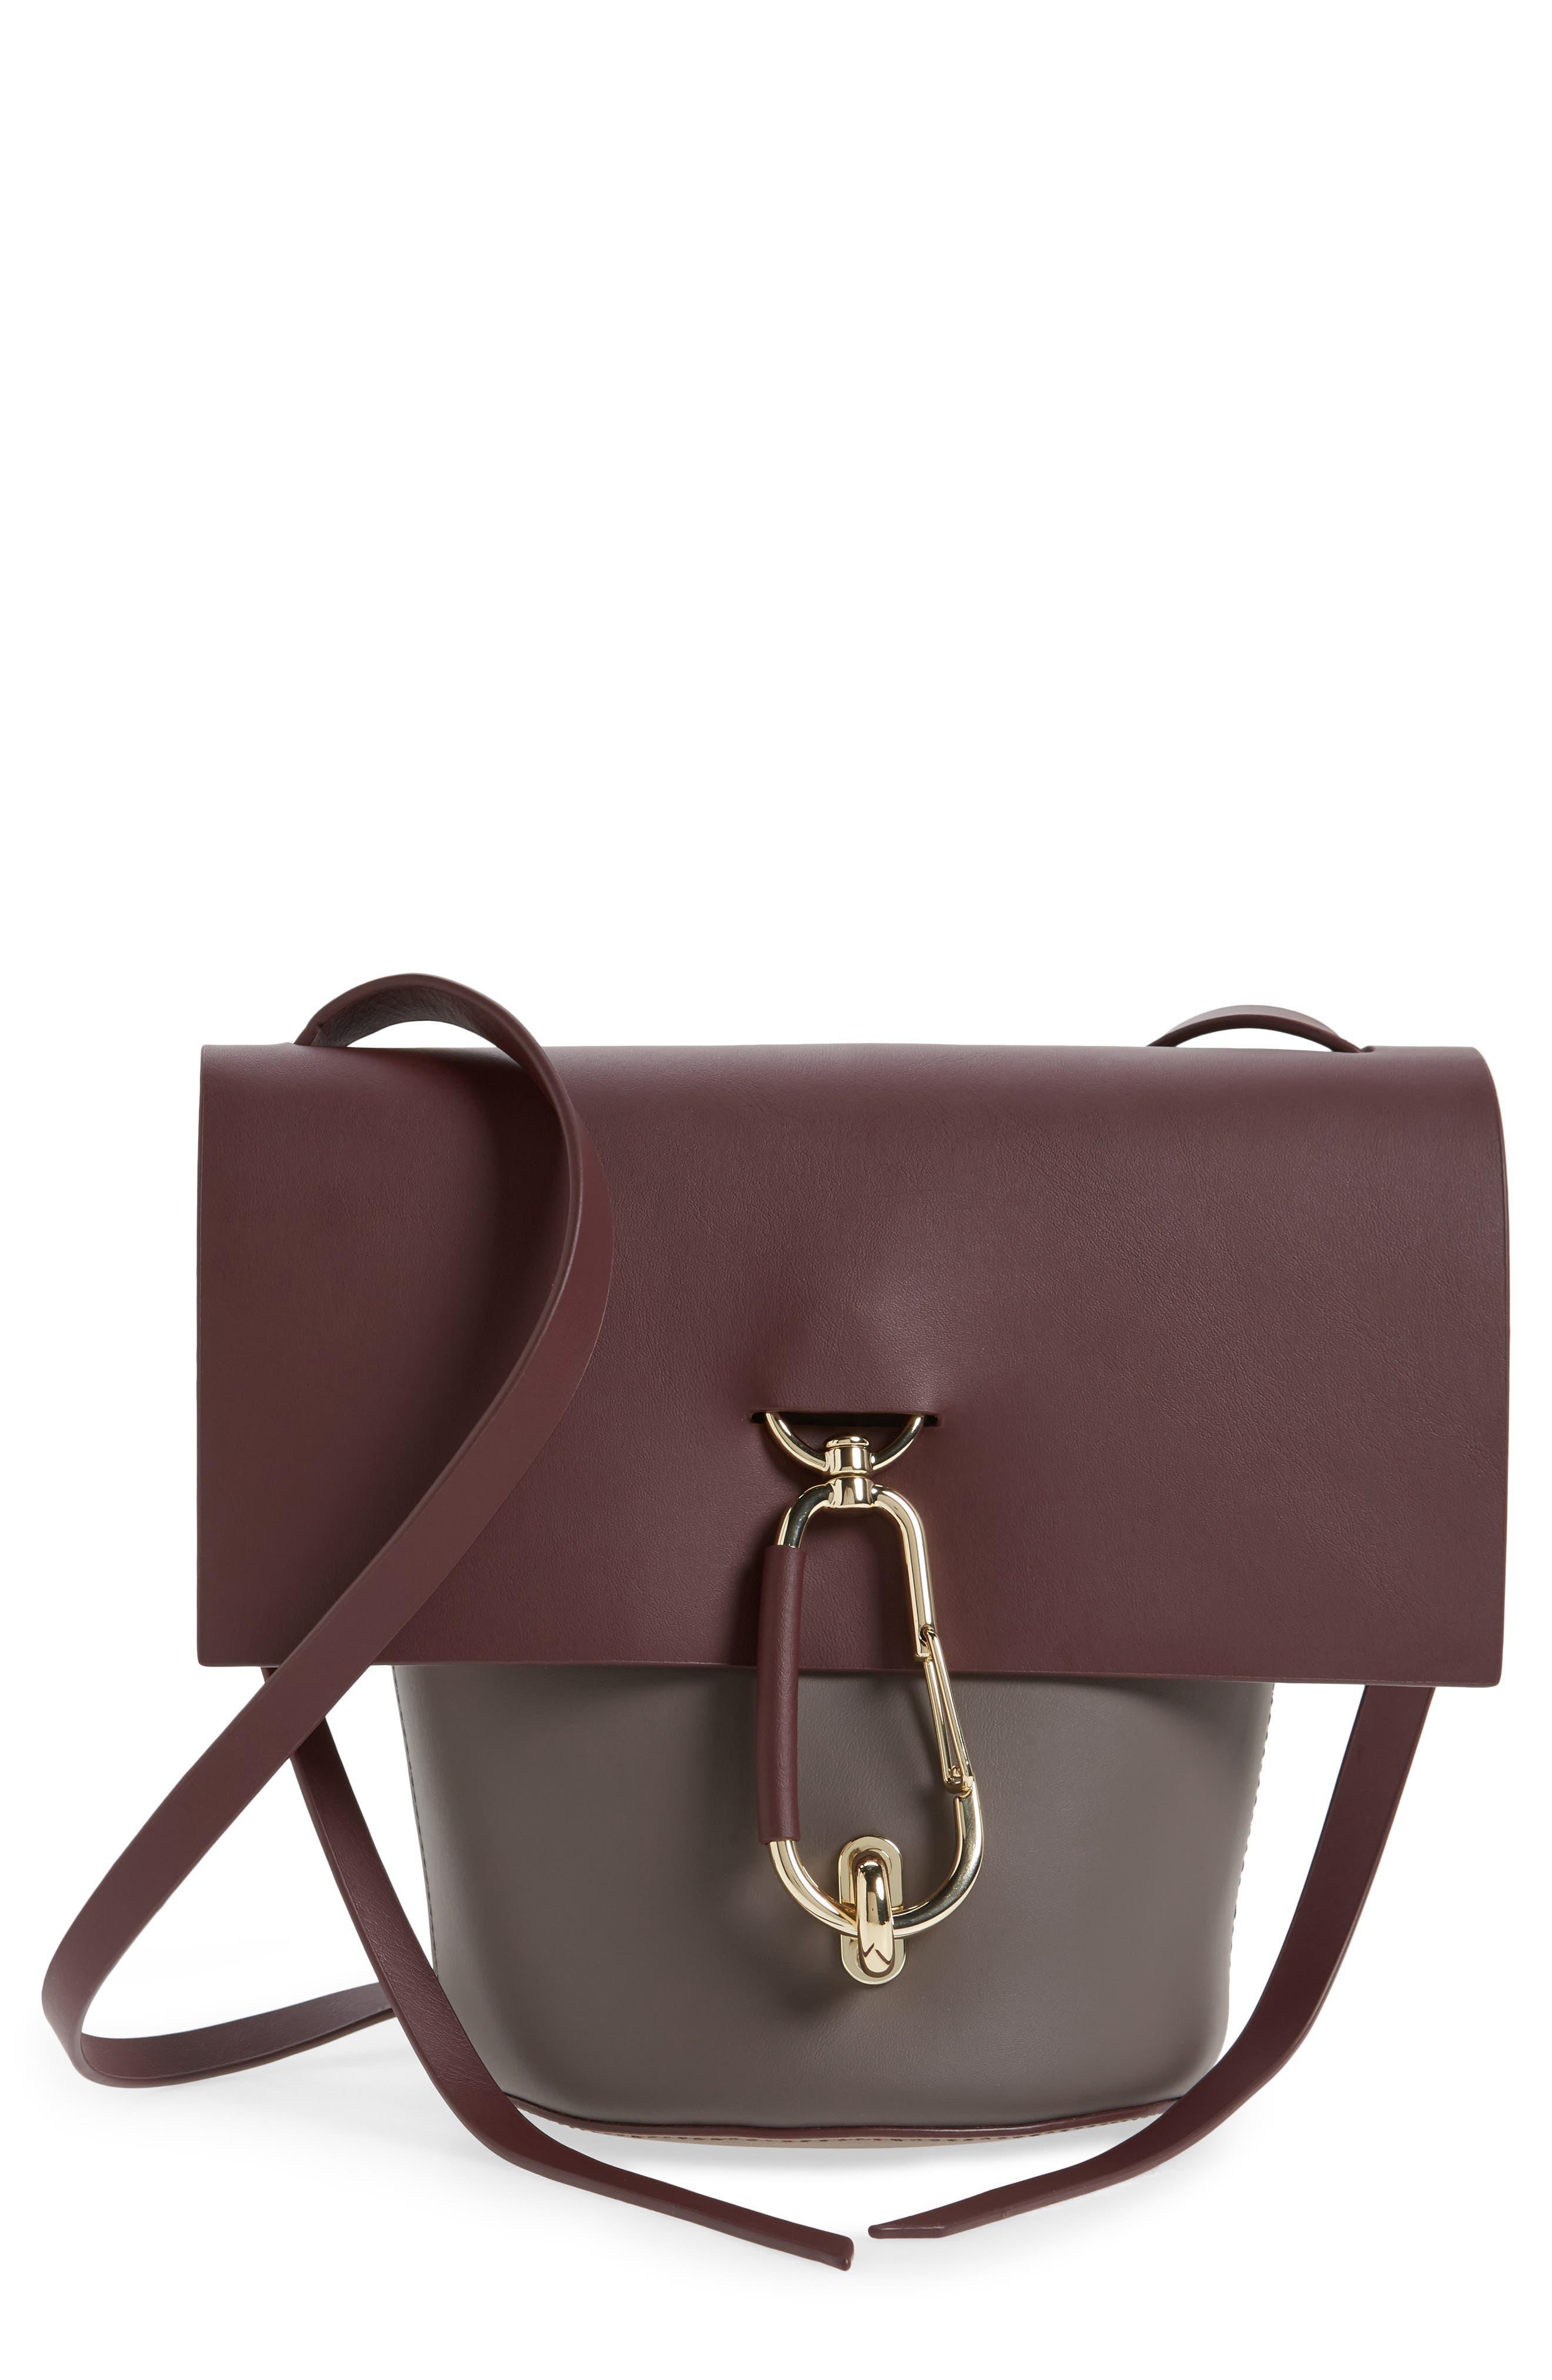 Alternate Image 1 Selected - ZAC Zac Posen Belay Colorblocked Leather Crossbody Bucket Bag